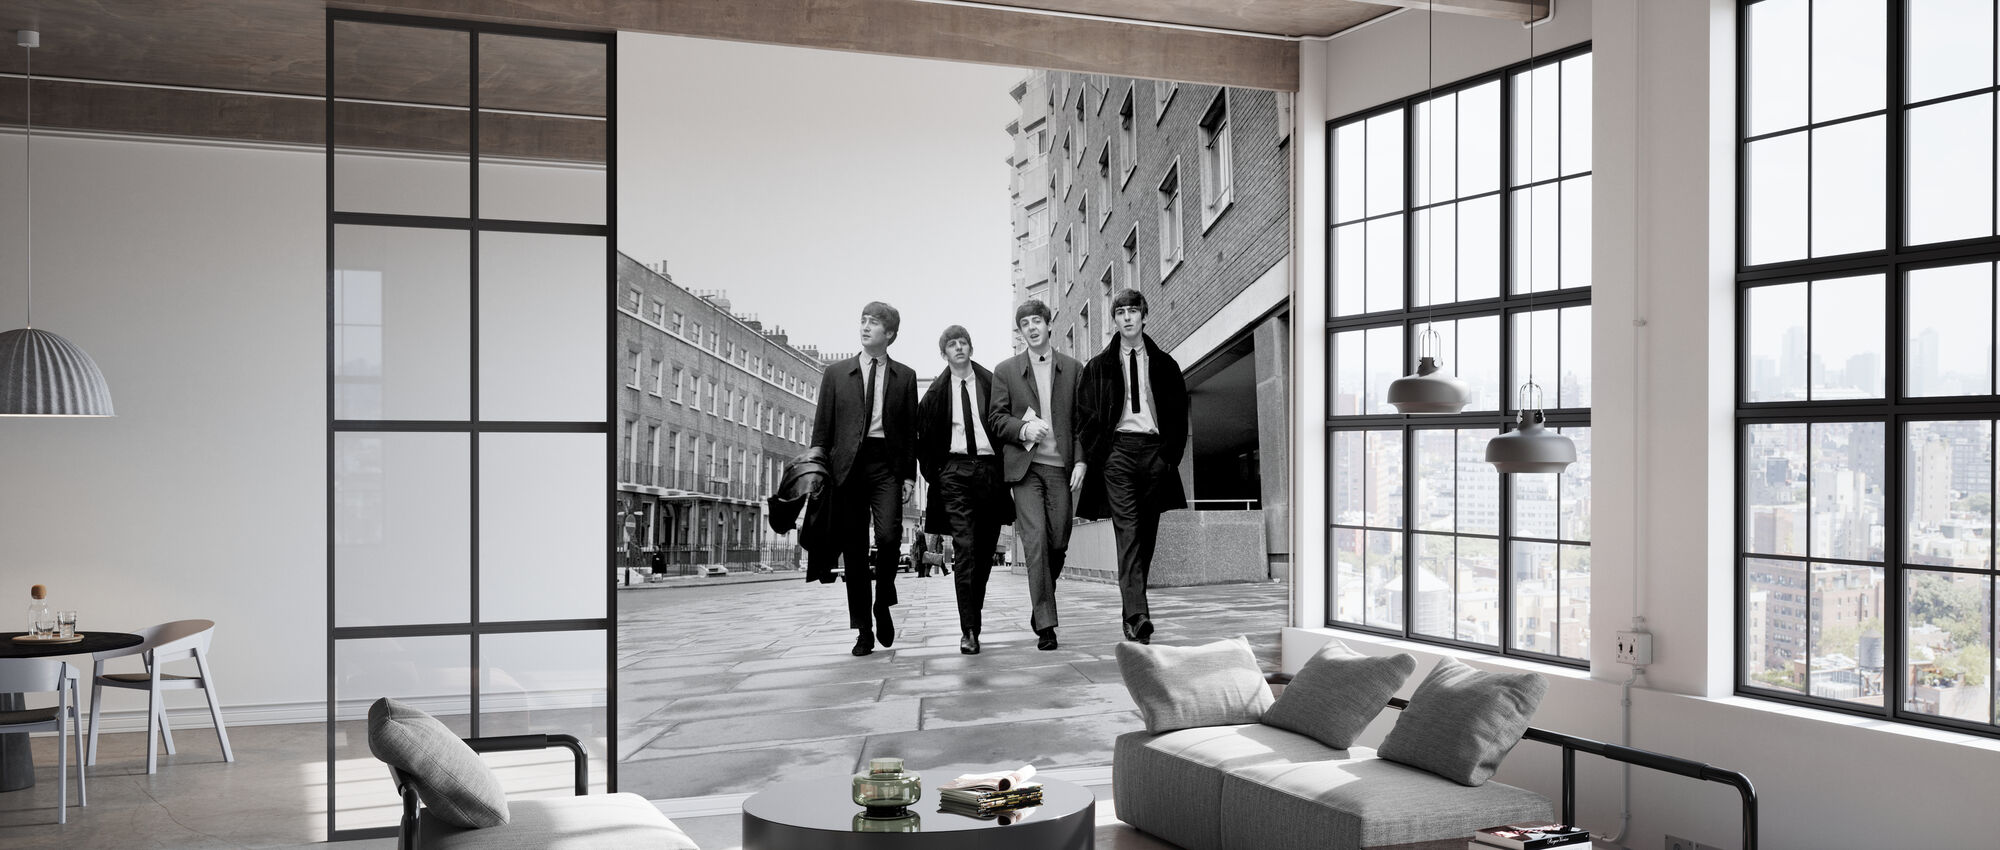 The Beatles - Sidewalk - Wallpaper - Office